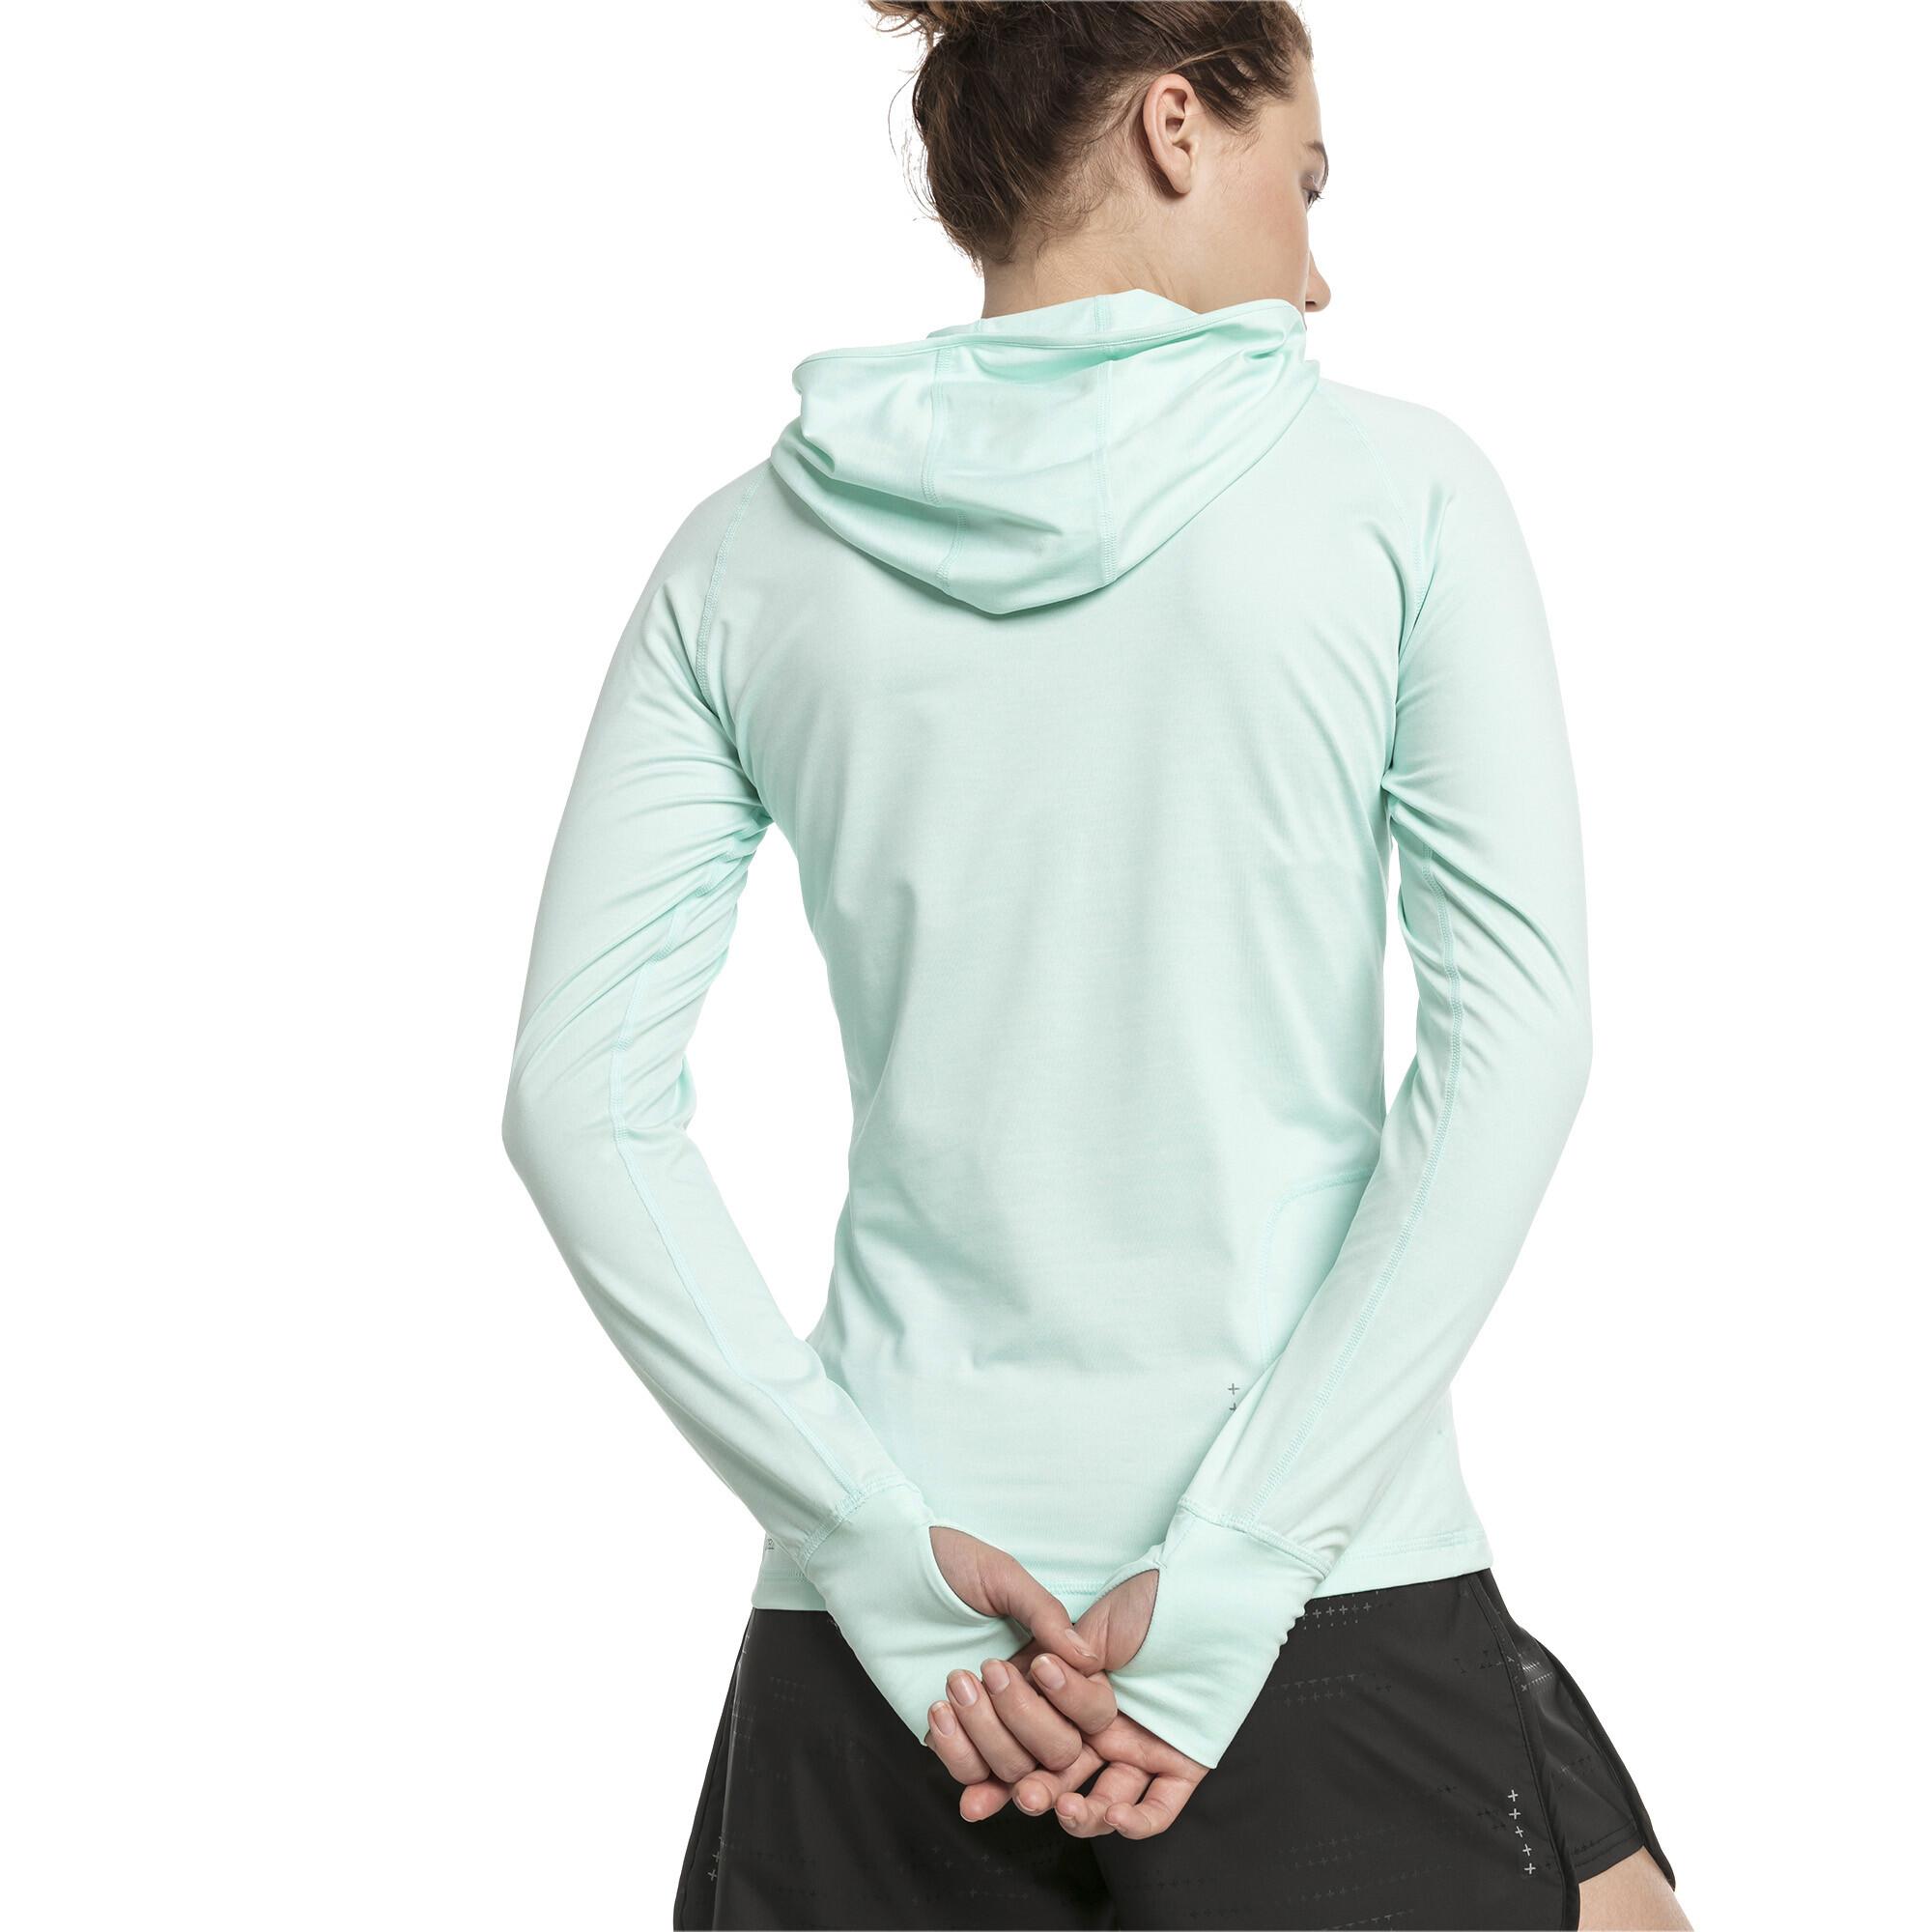 Image Puma Ignite Long Sleeve Hooded Women's Running Tee #2